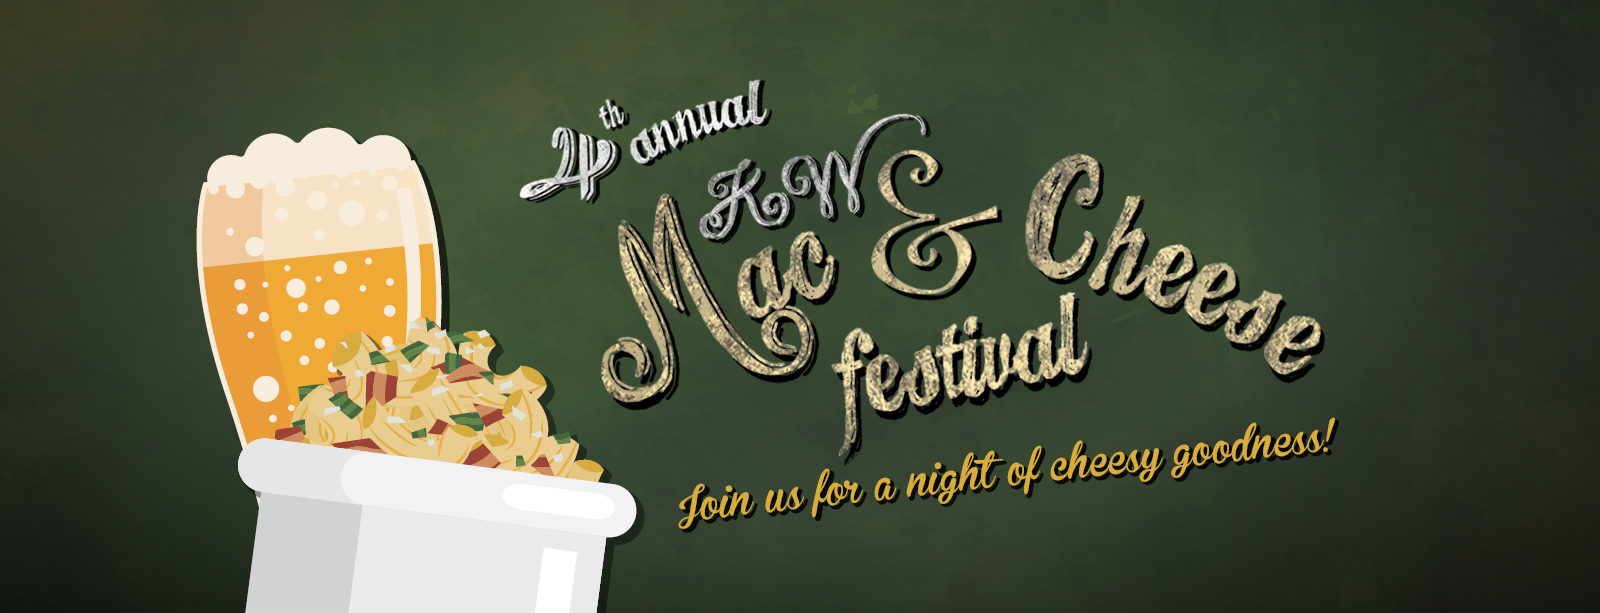 KW Mac & Cheese Festival